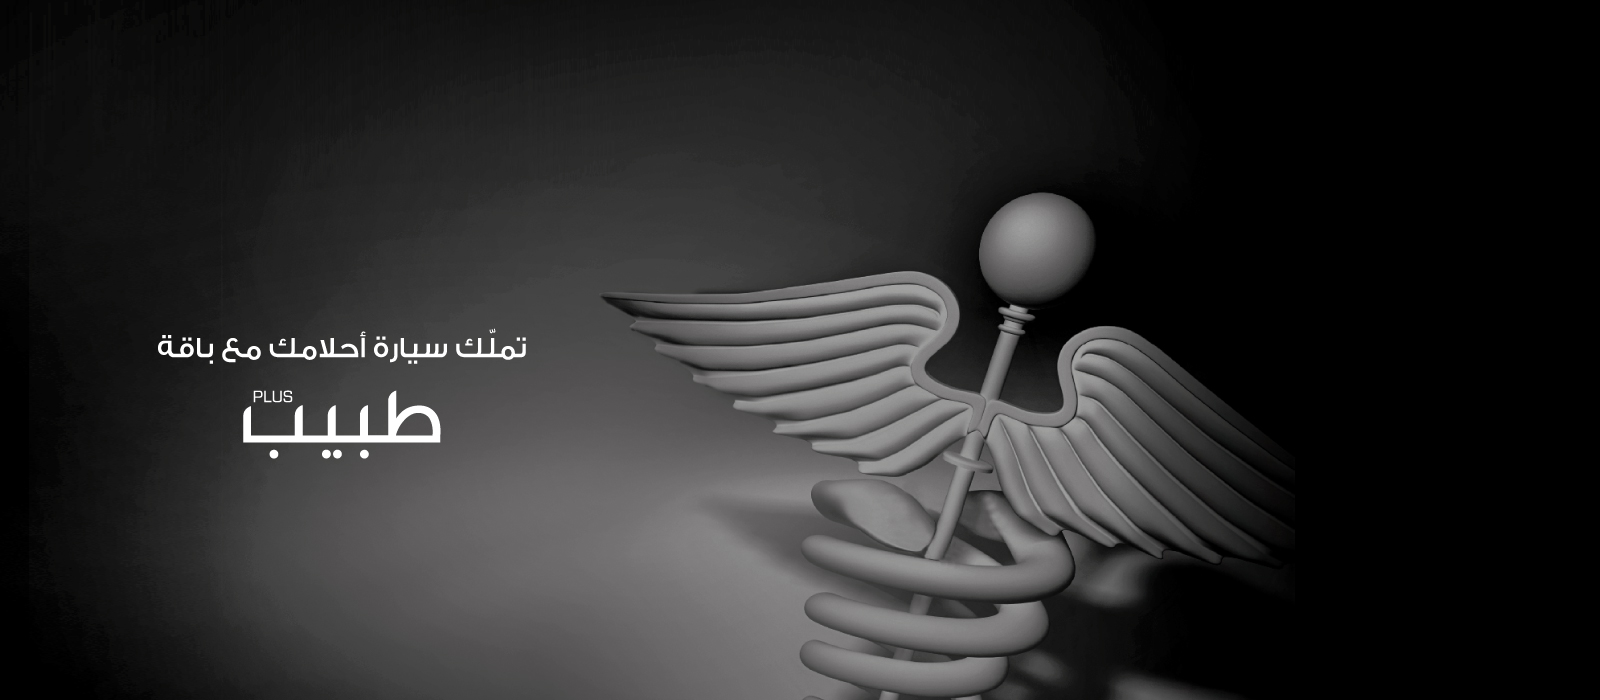 Tabeeb-Plus-Banners-web-ar